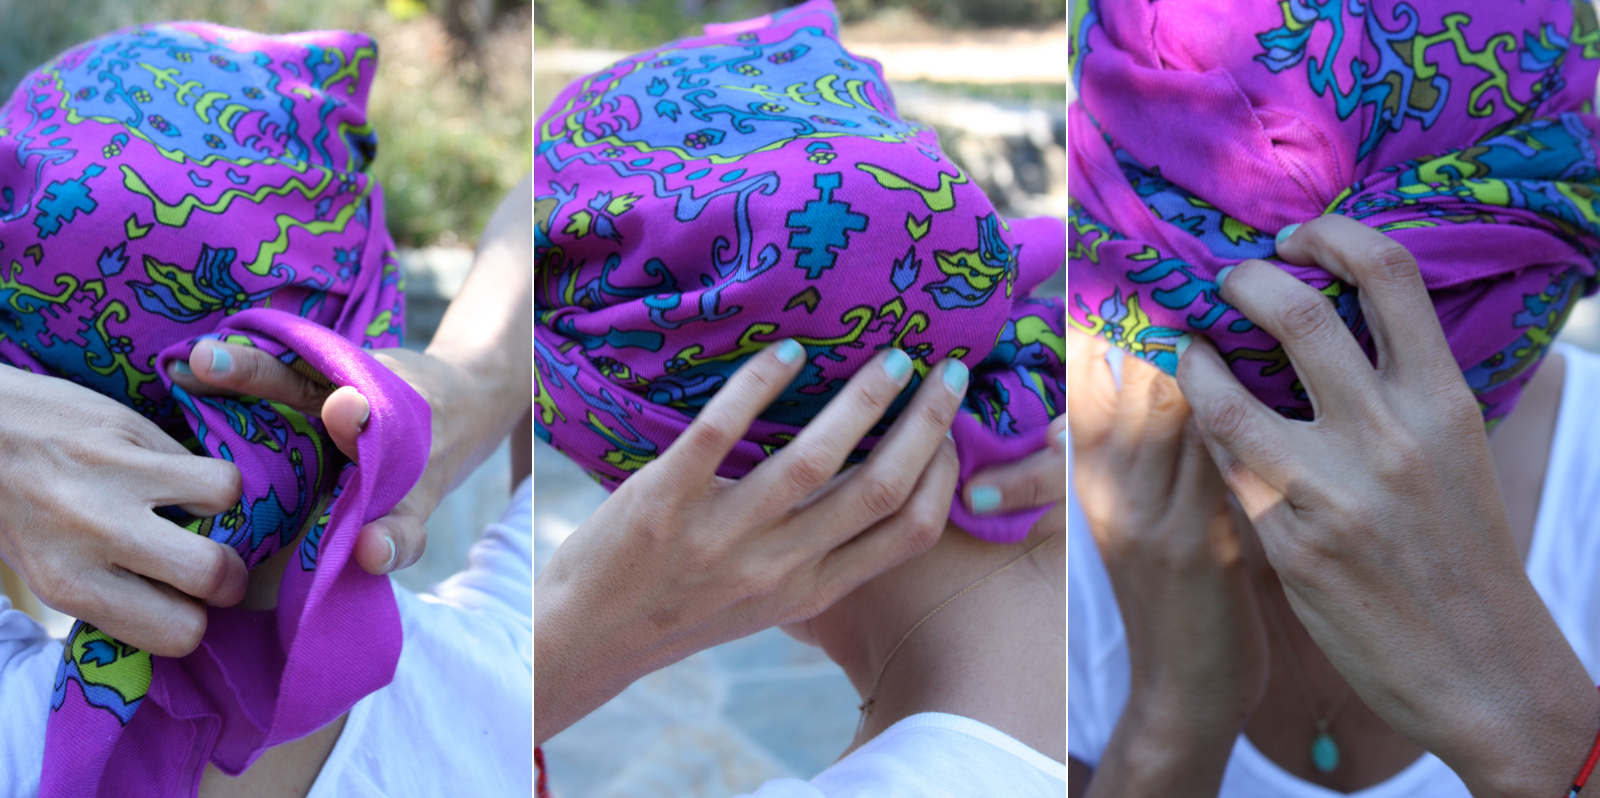 10 Ways To Tie A Turban/ Headscarf - Youth Village